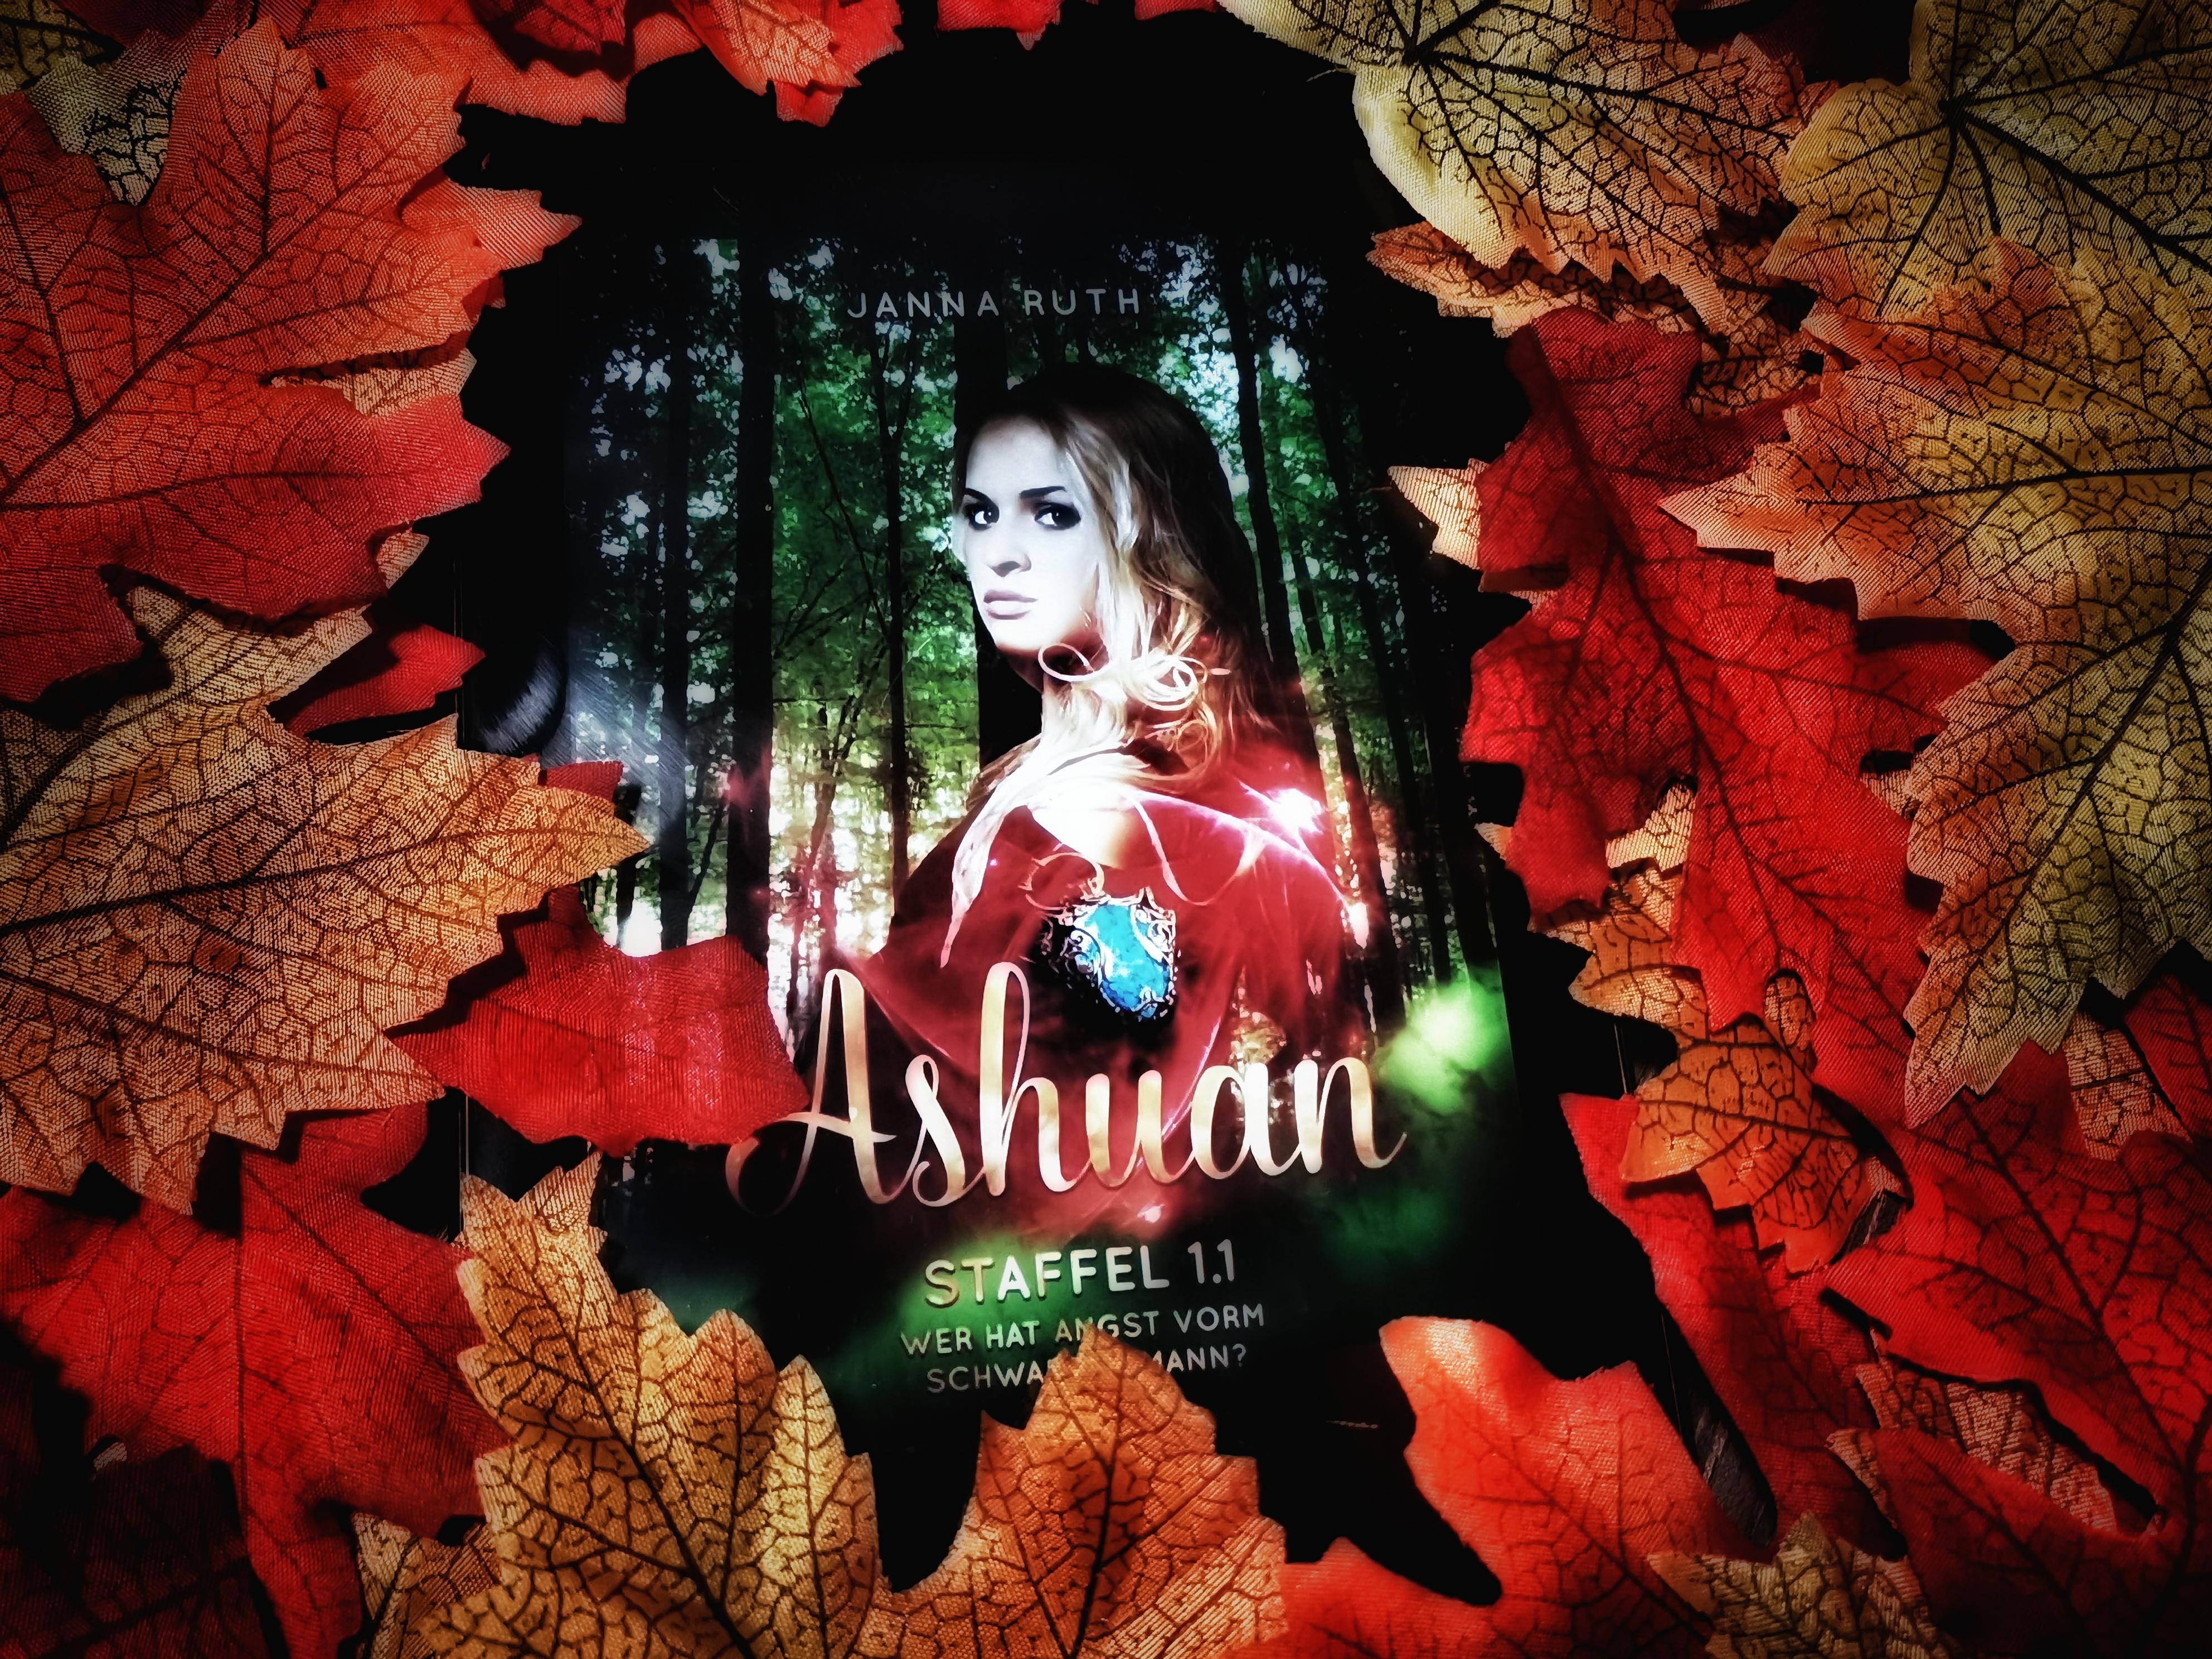 Ashuan Staffel 1 Cover